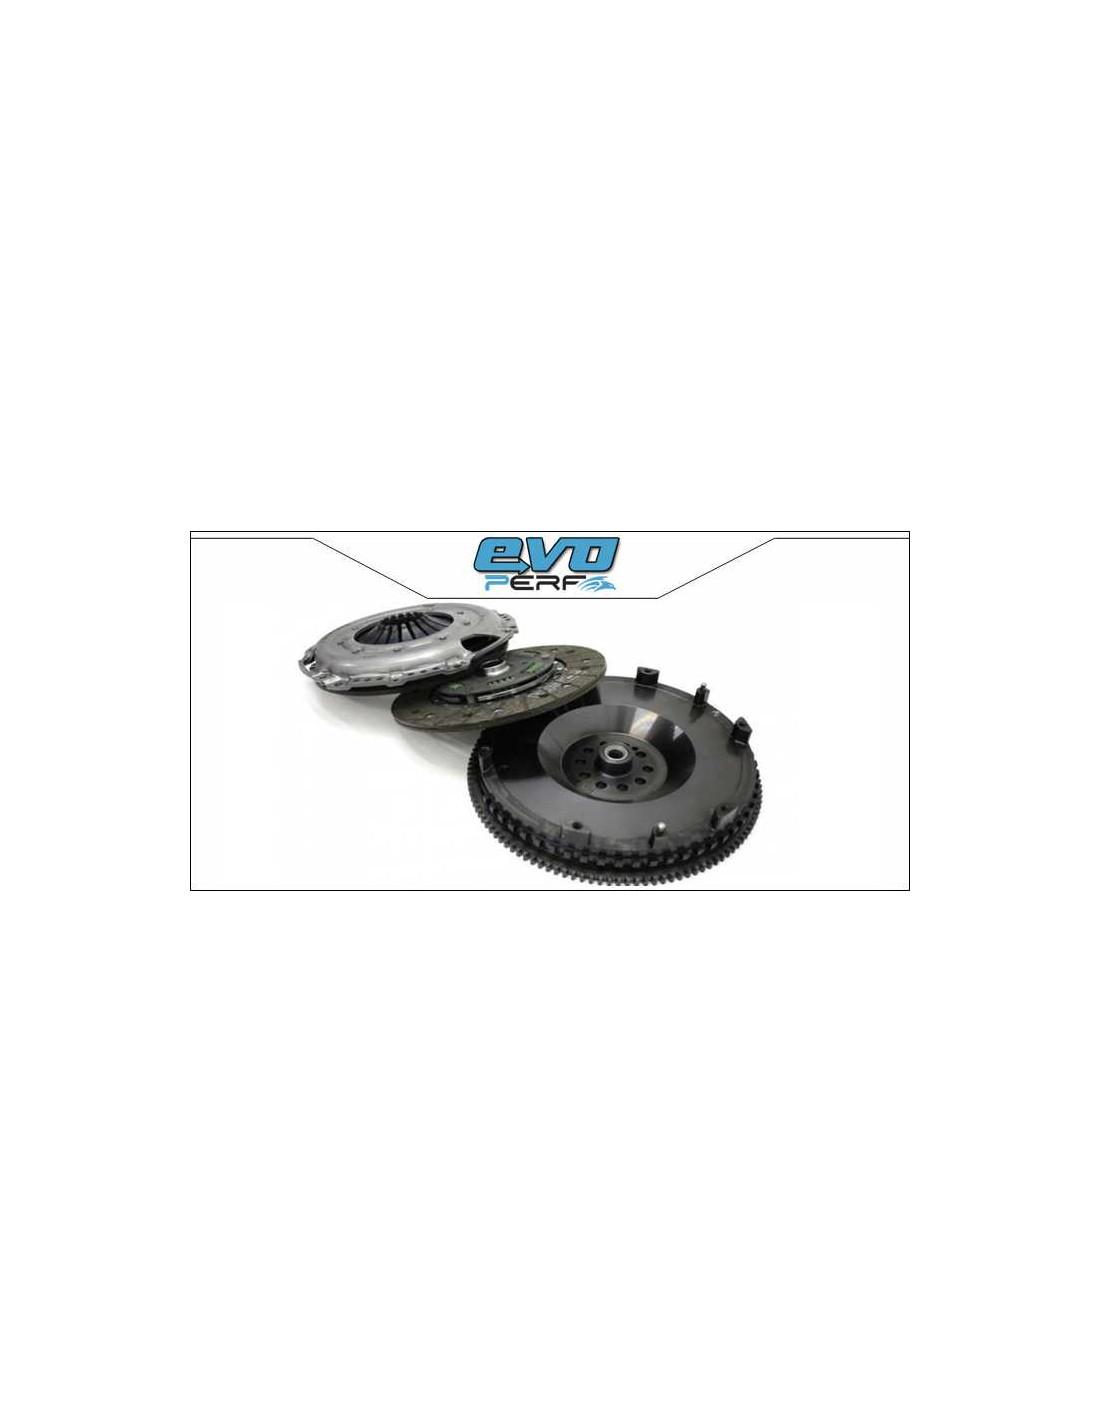 embrayage renforc volant moteur monomasse audi s4 b5 stage1 sach. Black Bedroom Furniture Sets. Home Design Ideas